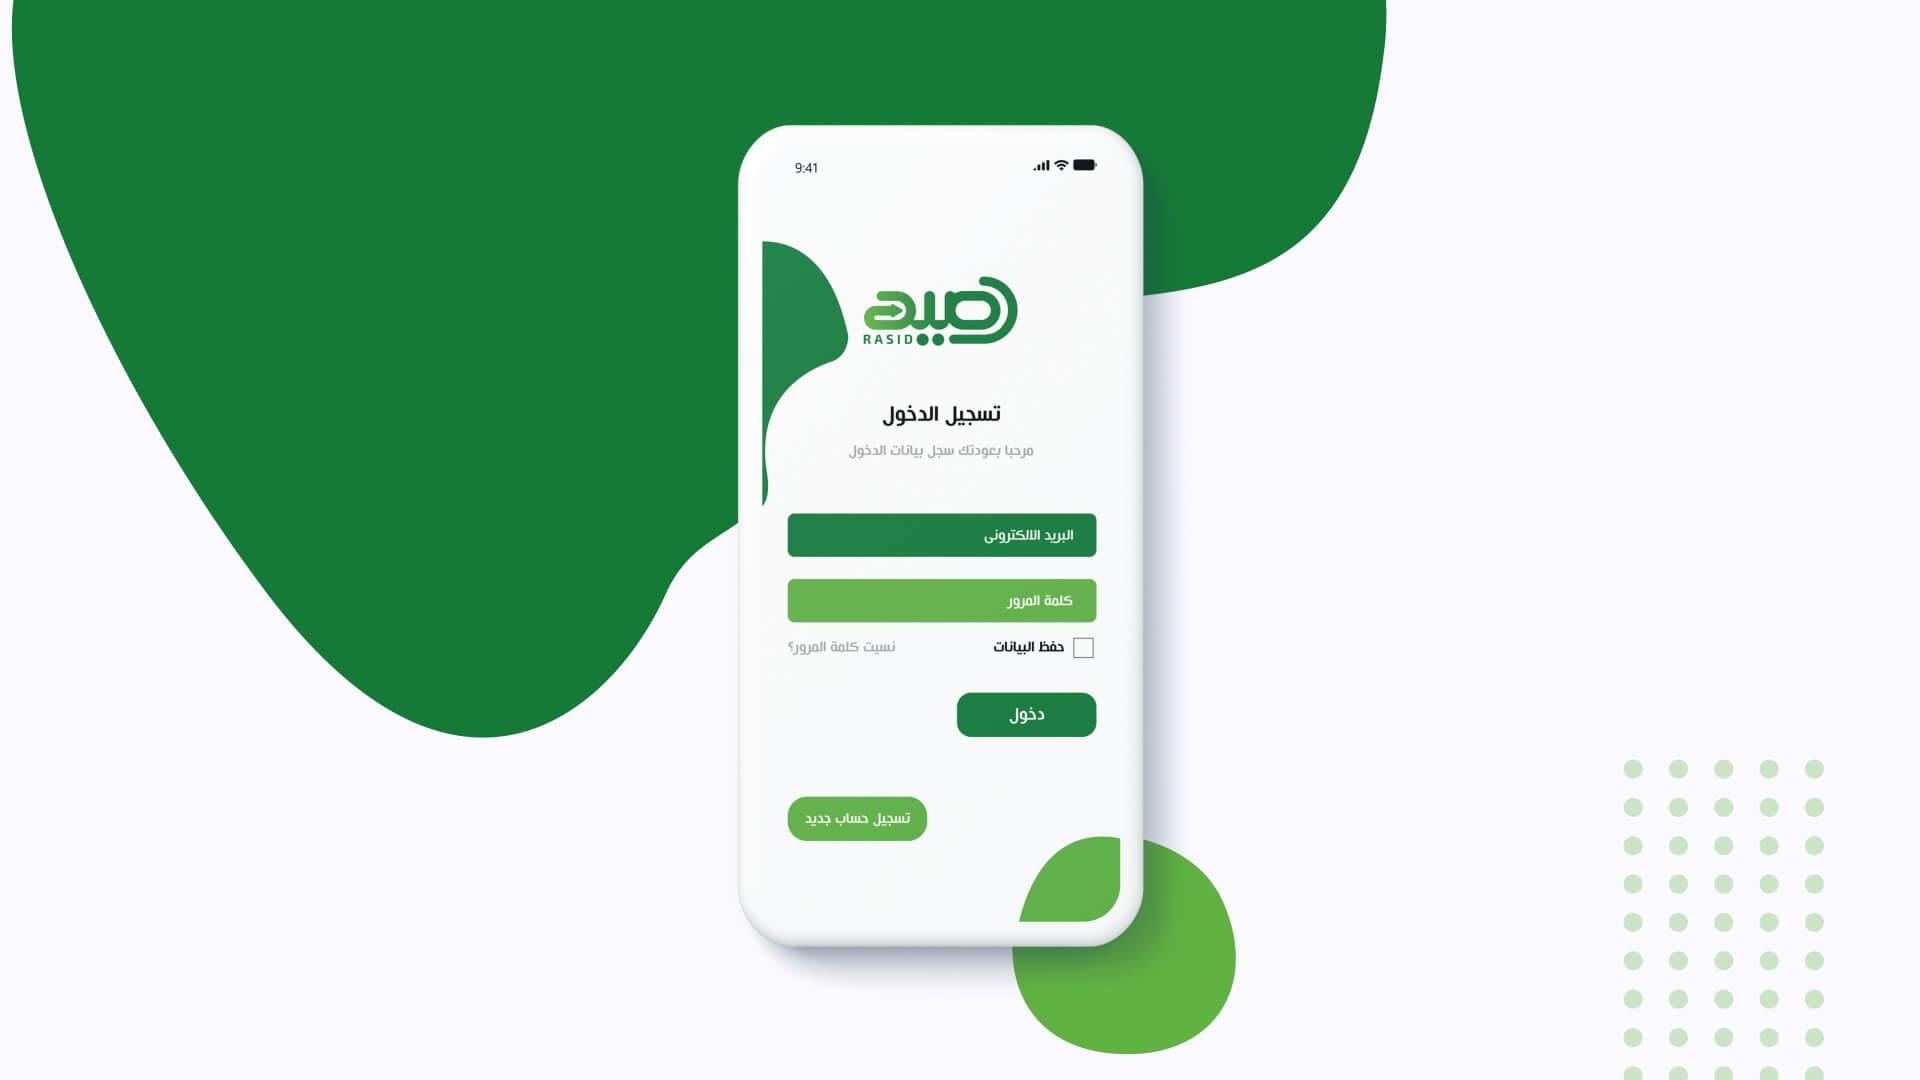 Rashid app